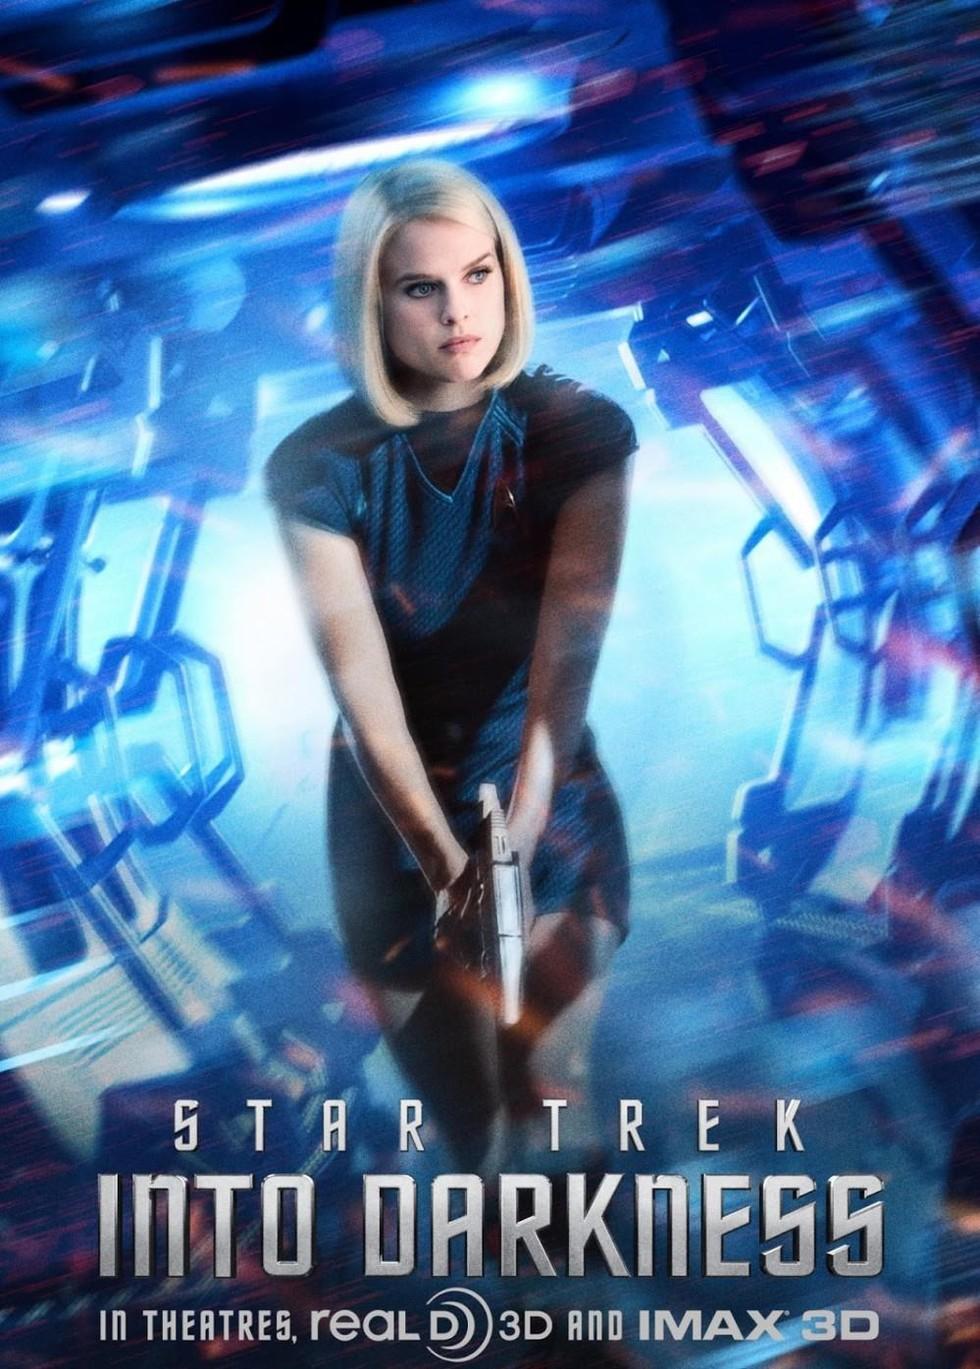 Star Trek Into Darkness - Movie Poster #10 (Large)